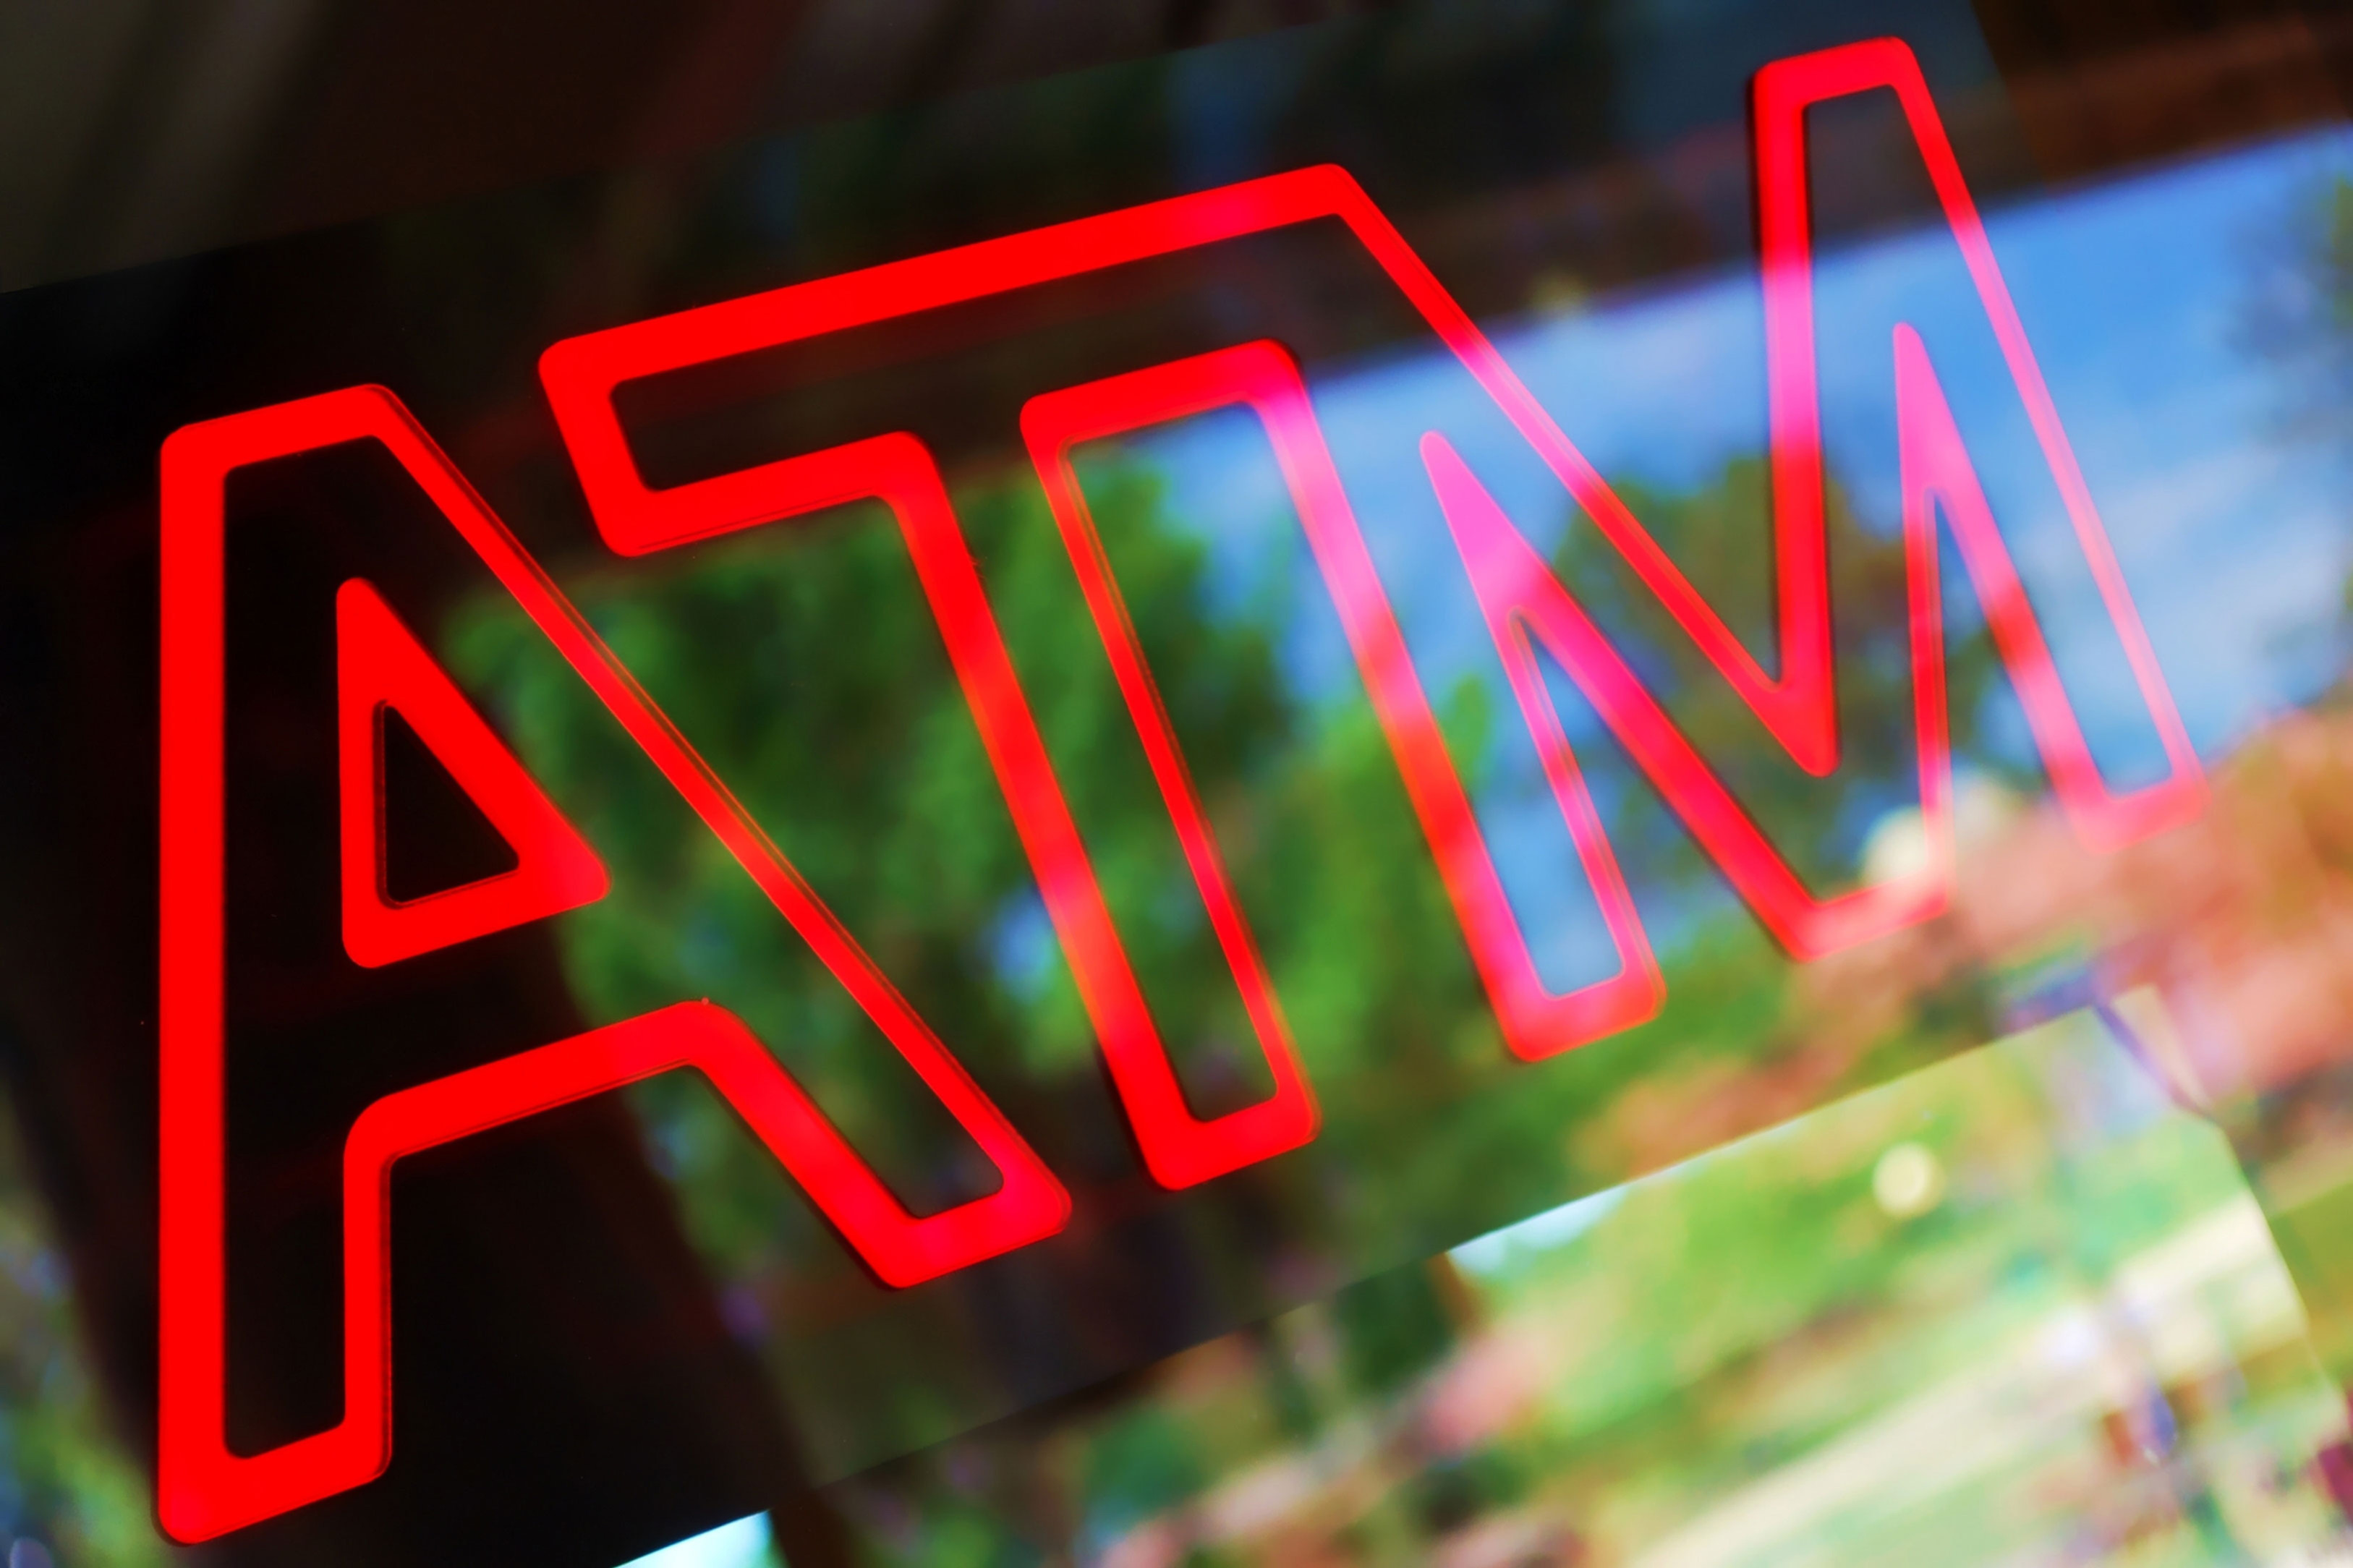 ATM Accessories/Security